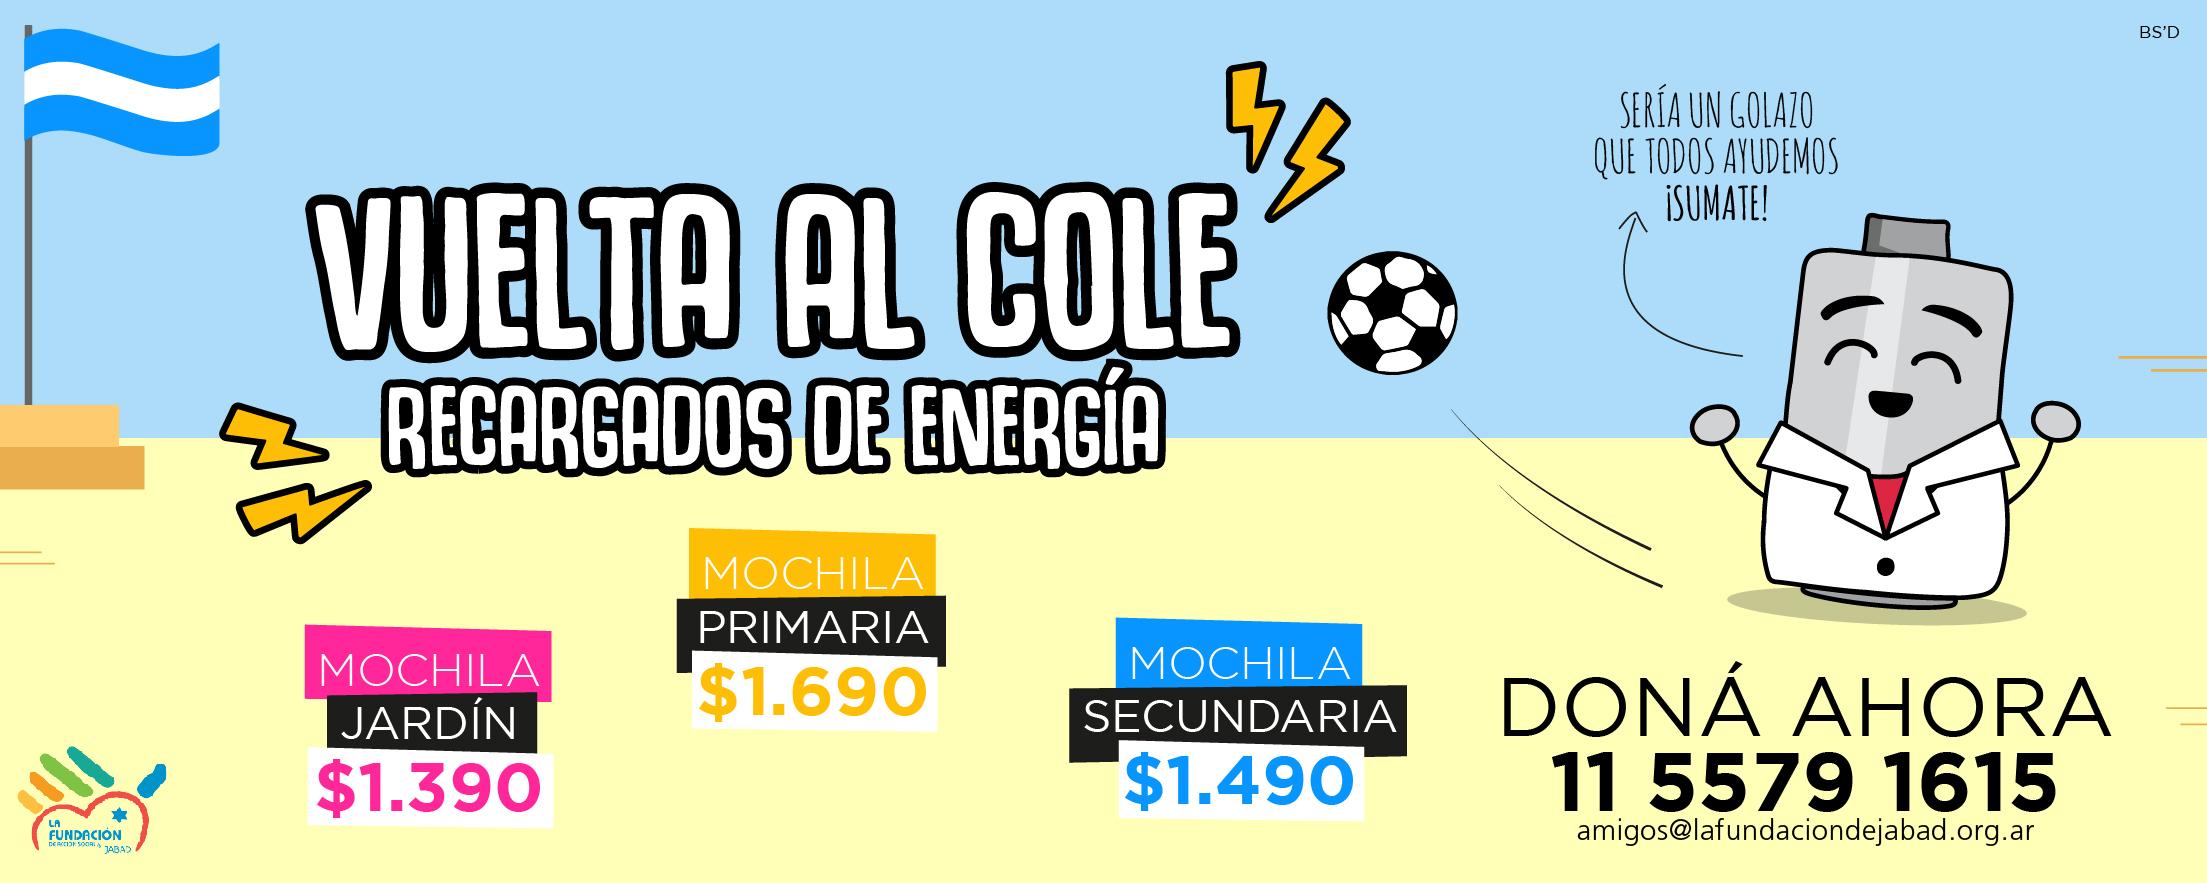 Fundacion_Vuelta al cole_Portada web 2